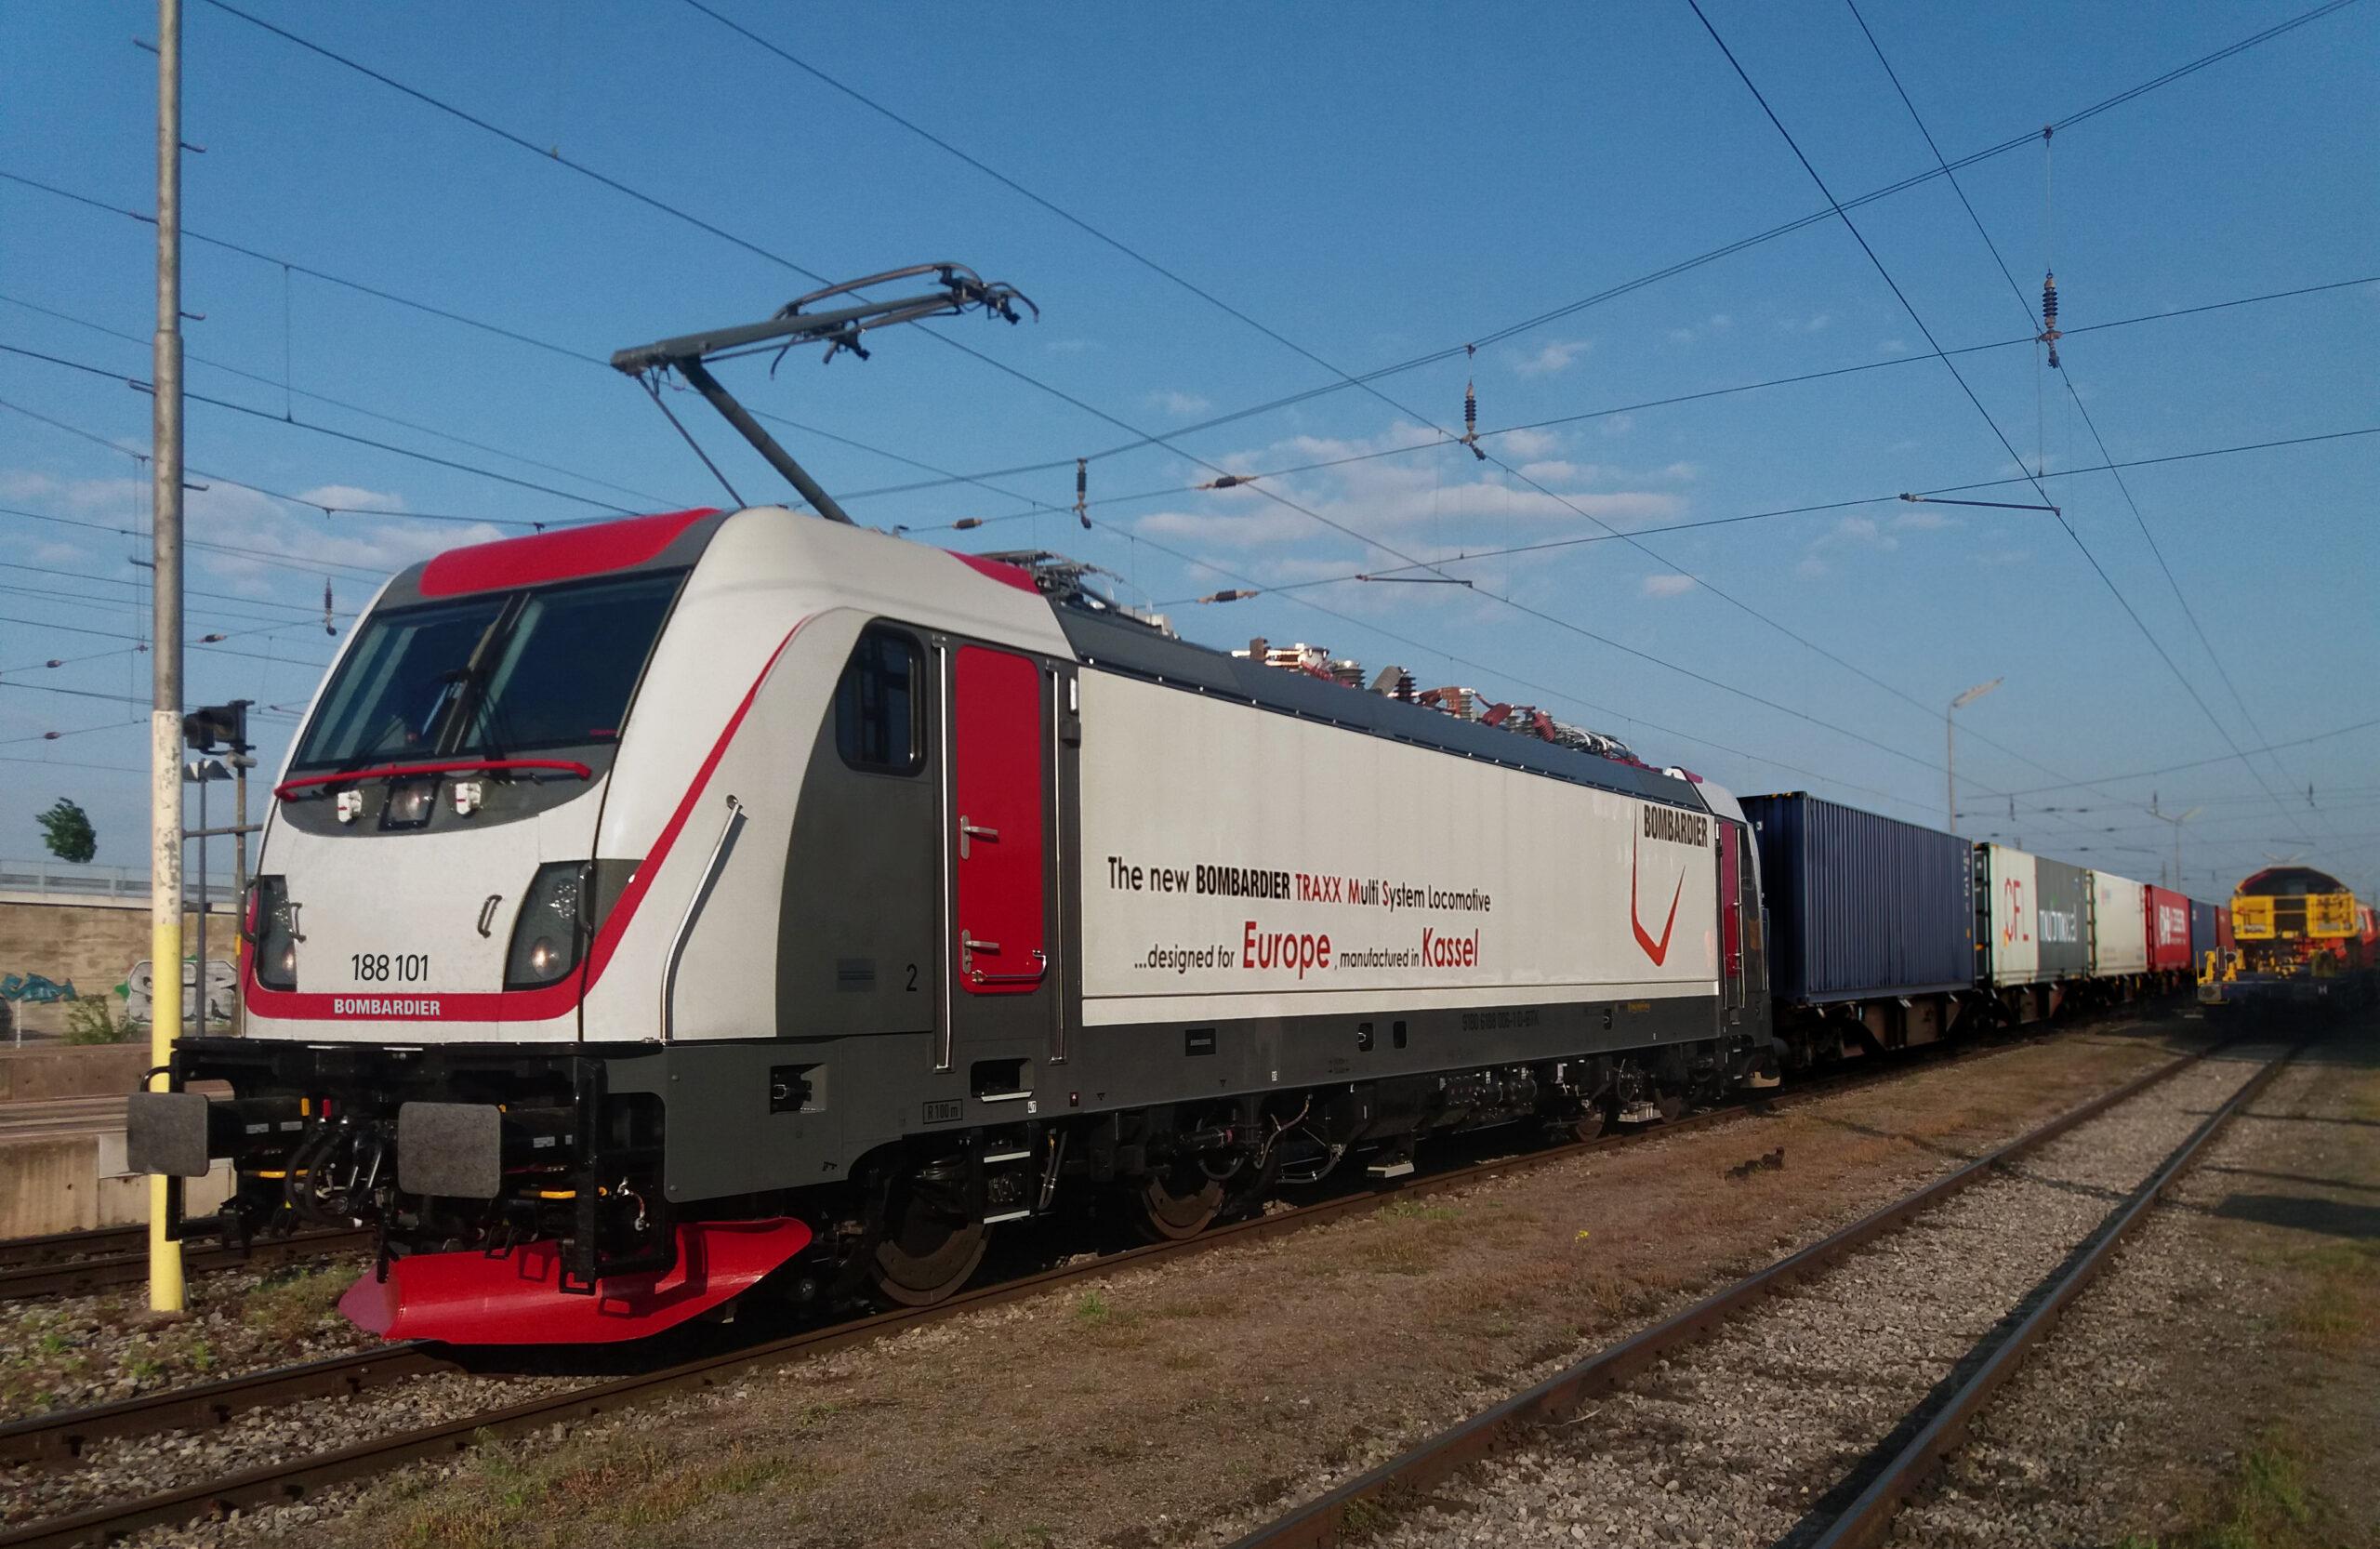 A Bombardier TRAXX multi-system locomotive